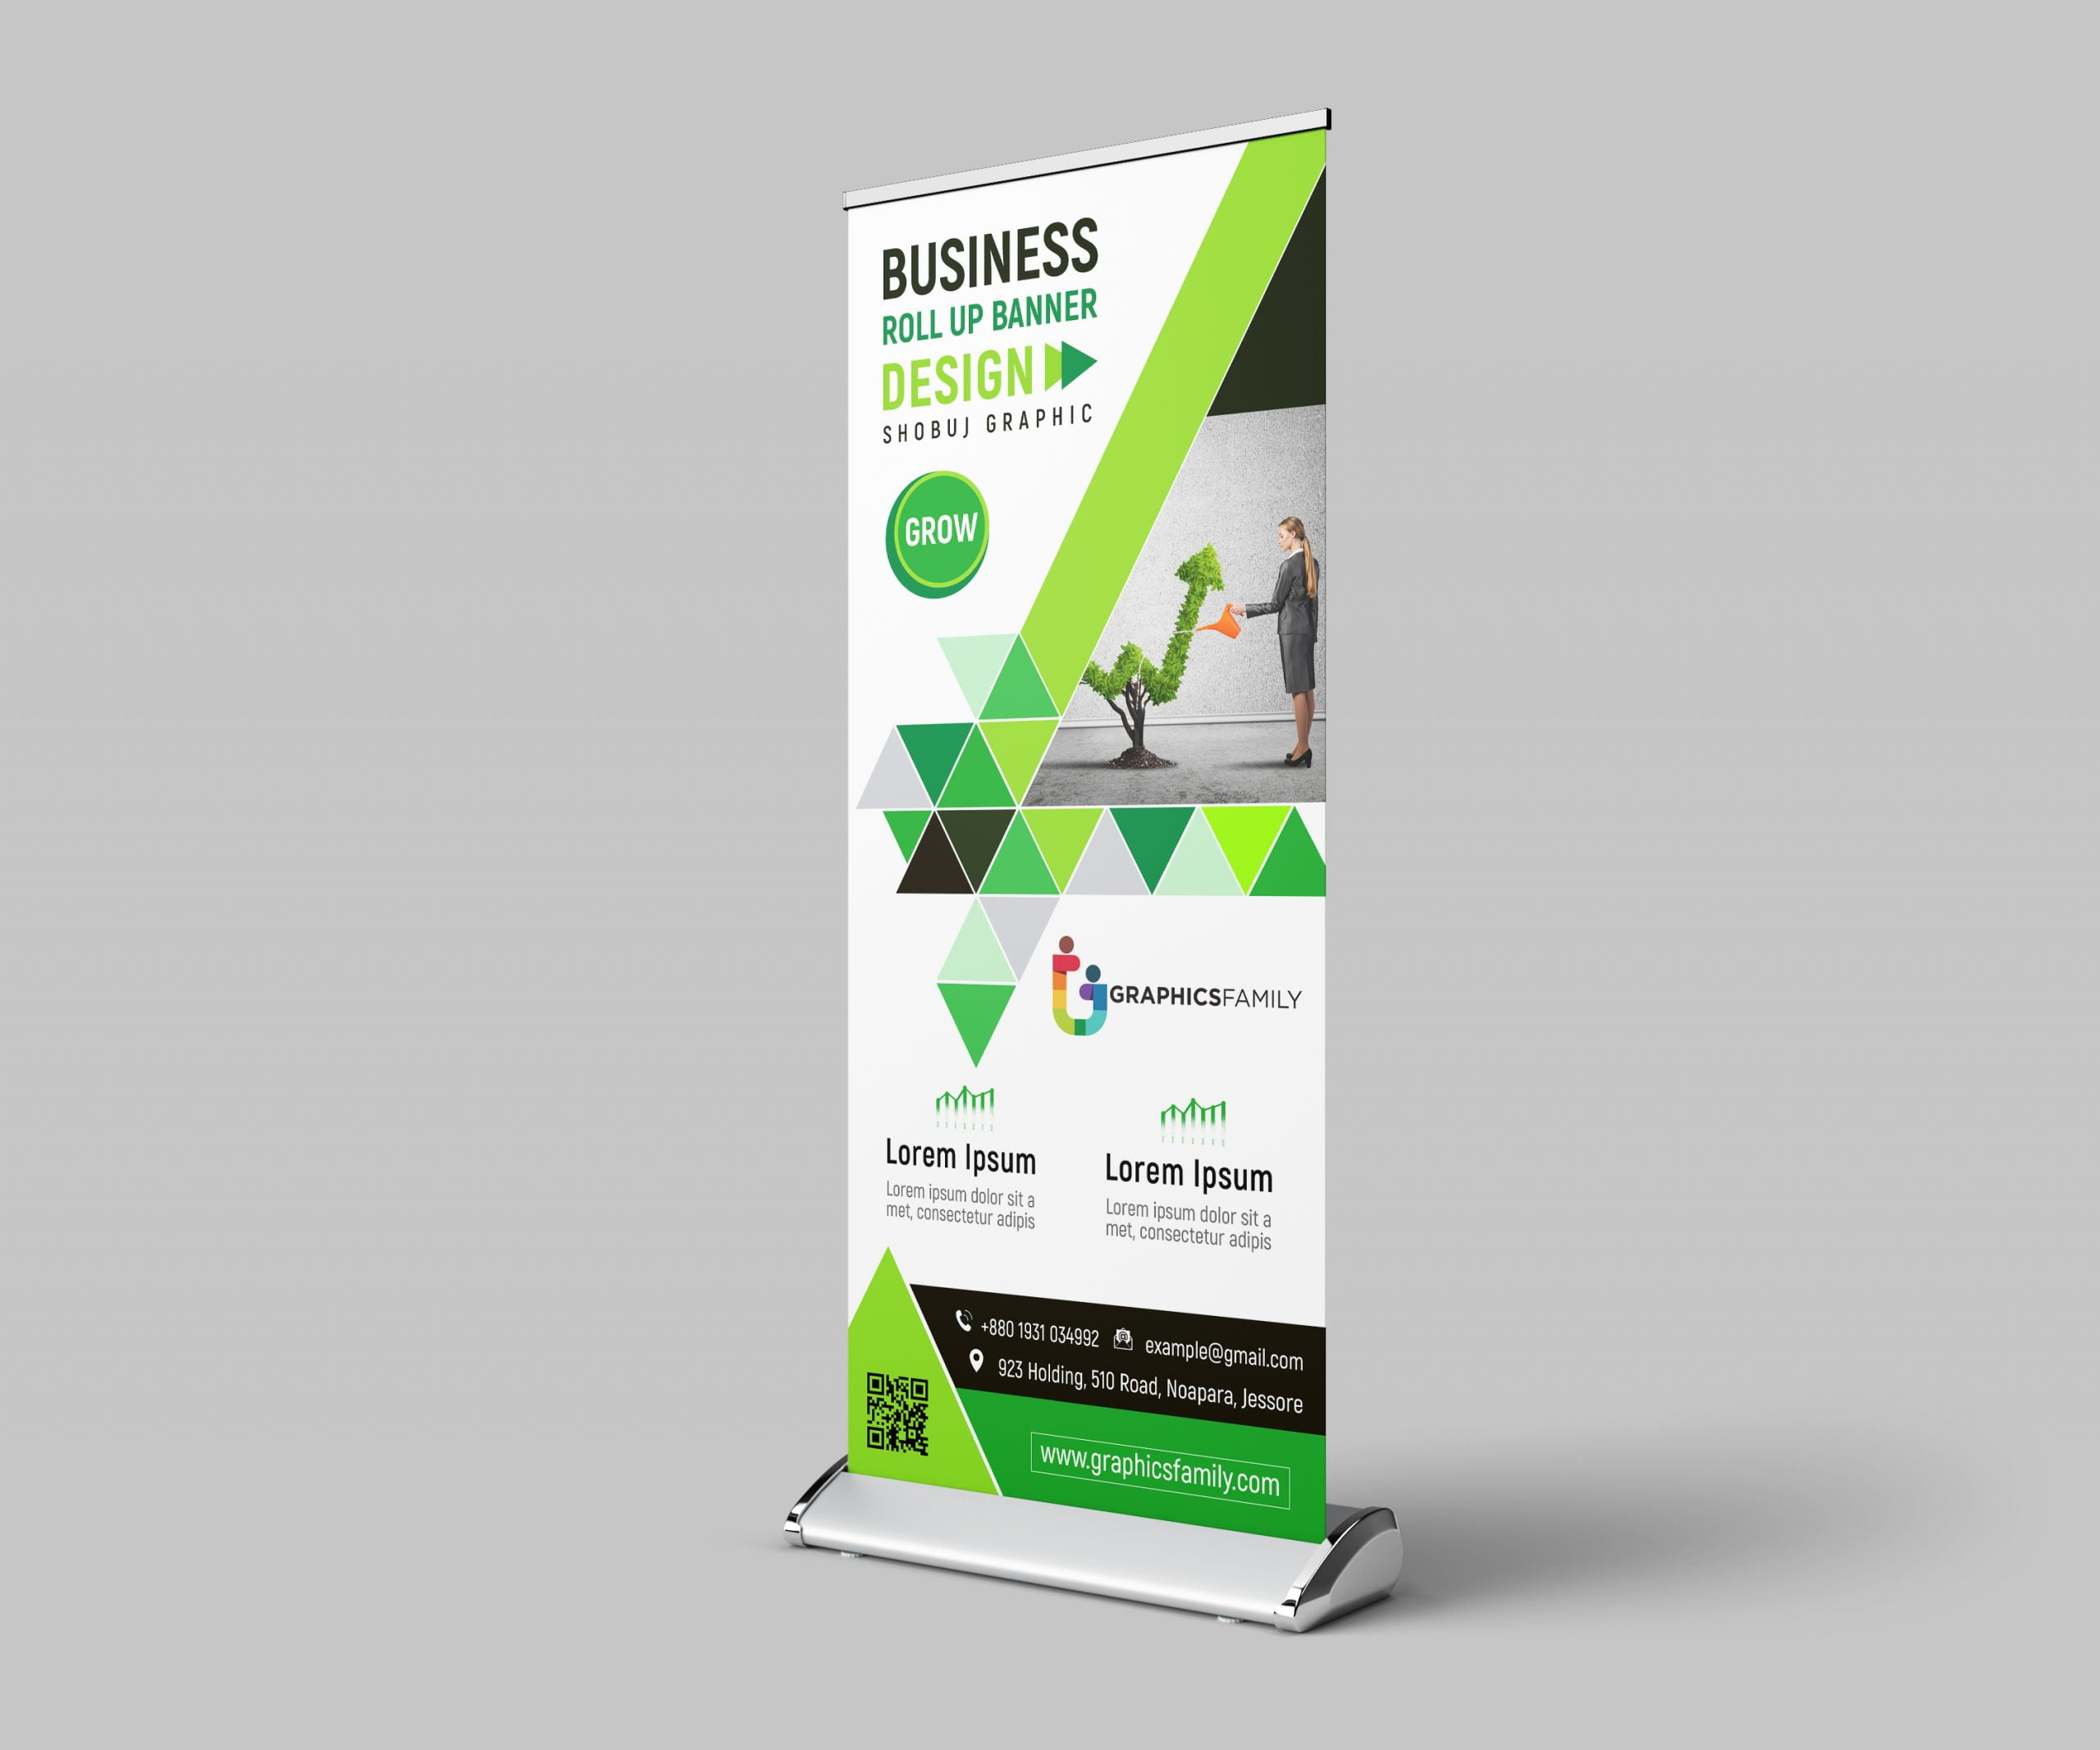 Free-Modern-Professional-Business-Roll-Up-Banner-Design